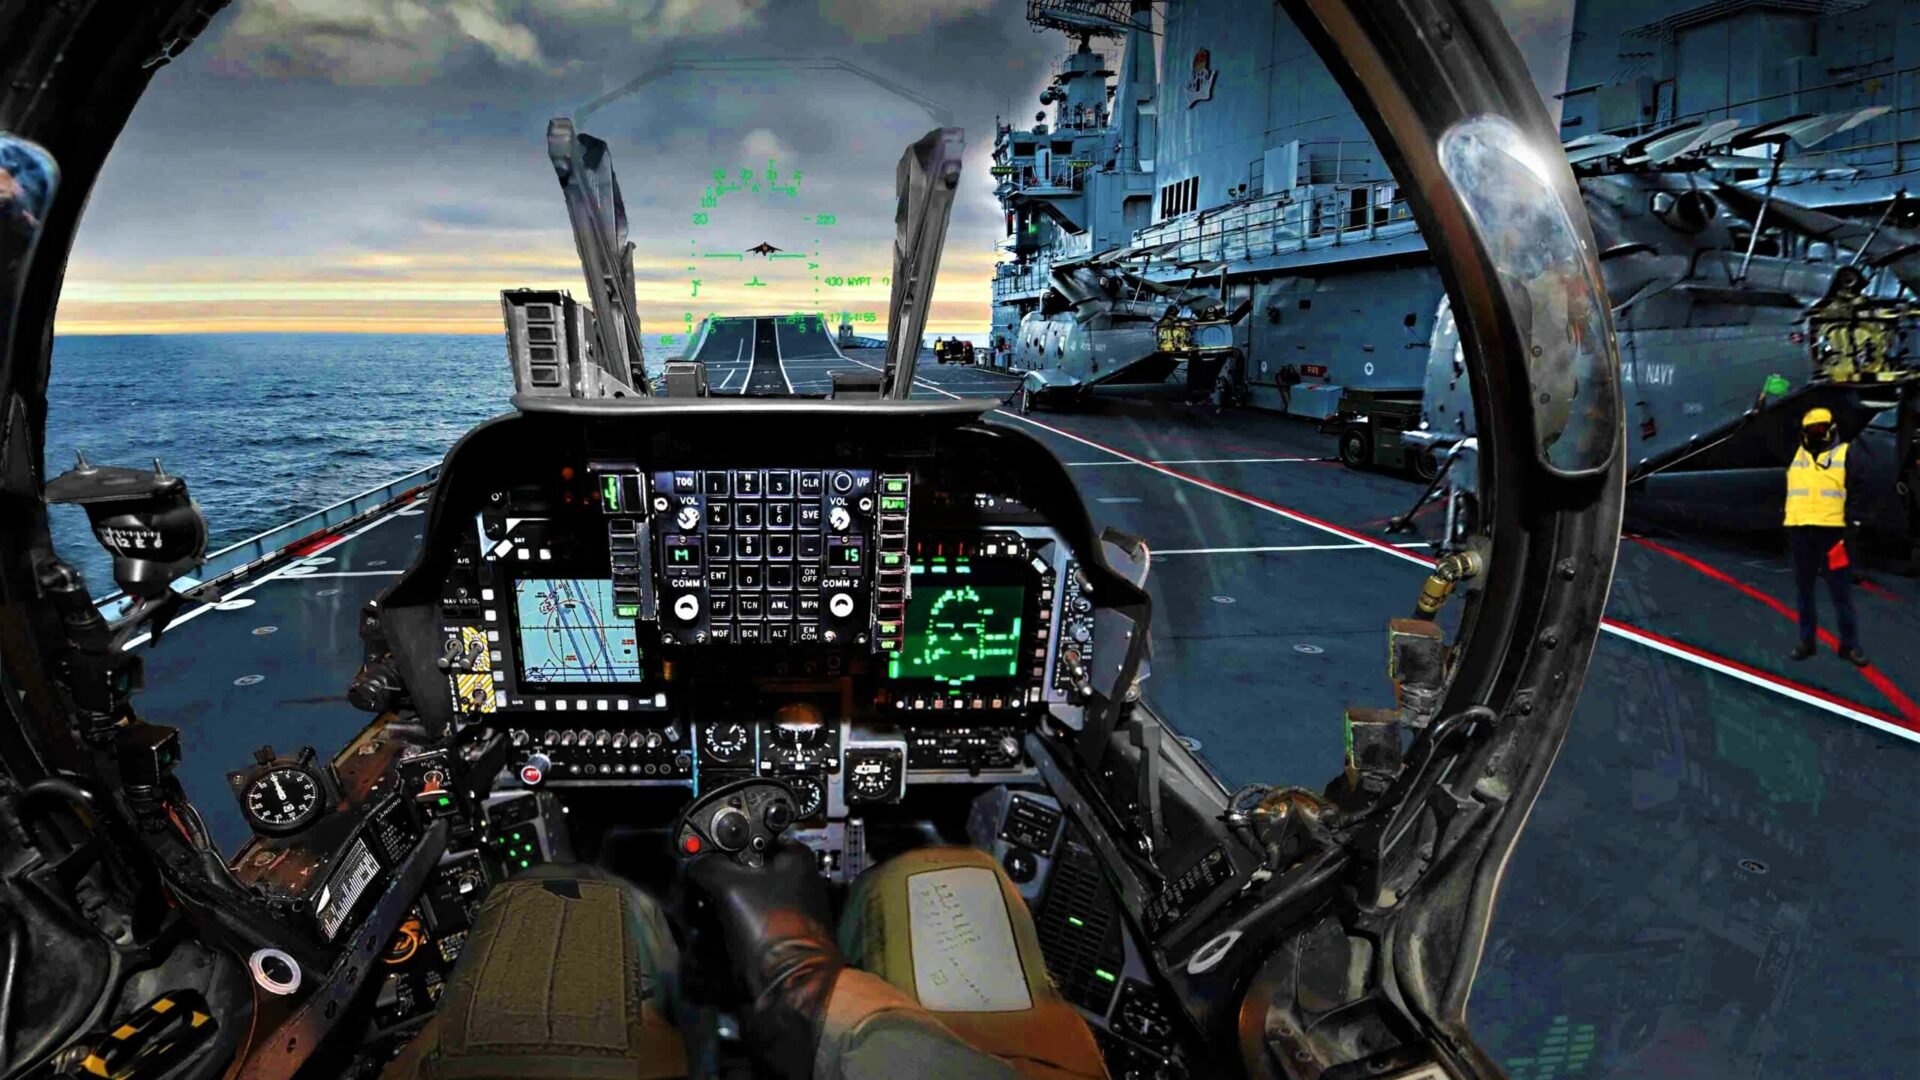 Airplane-Cockpit-Wallpaper-HD-73+-images-.jpg